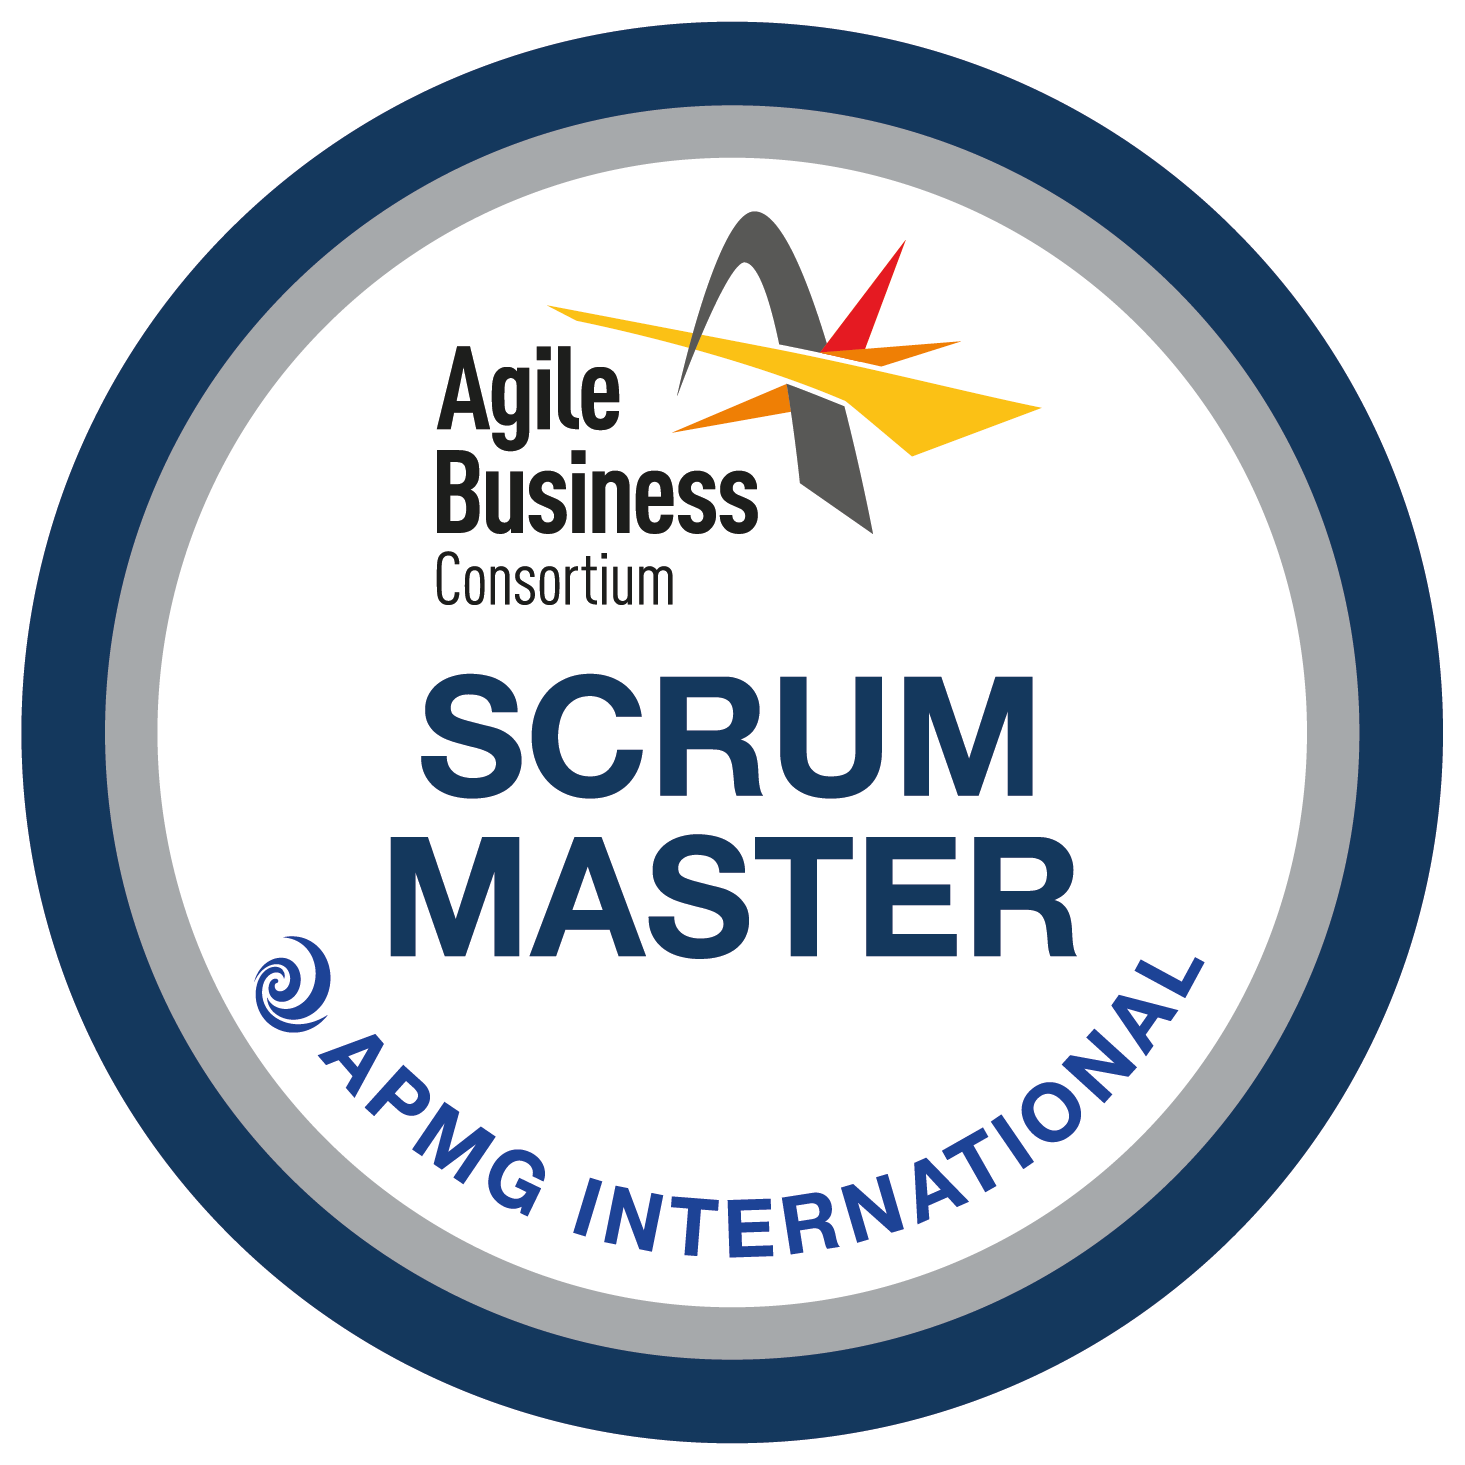 abc scrum master certification